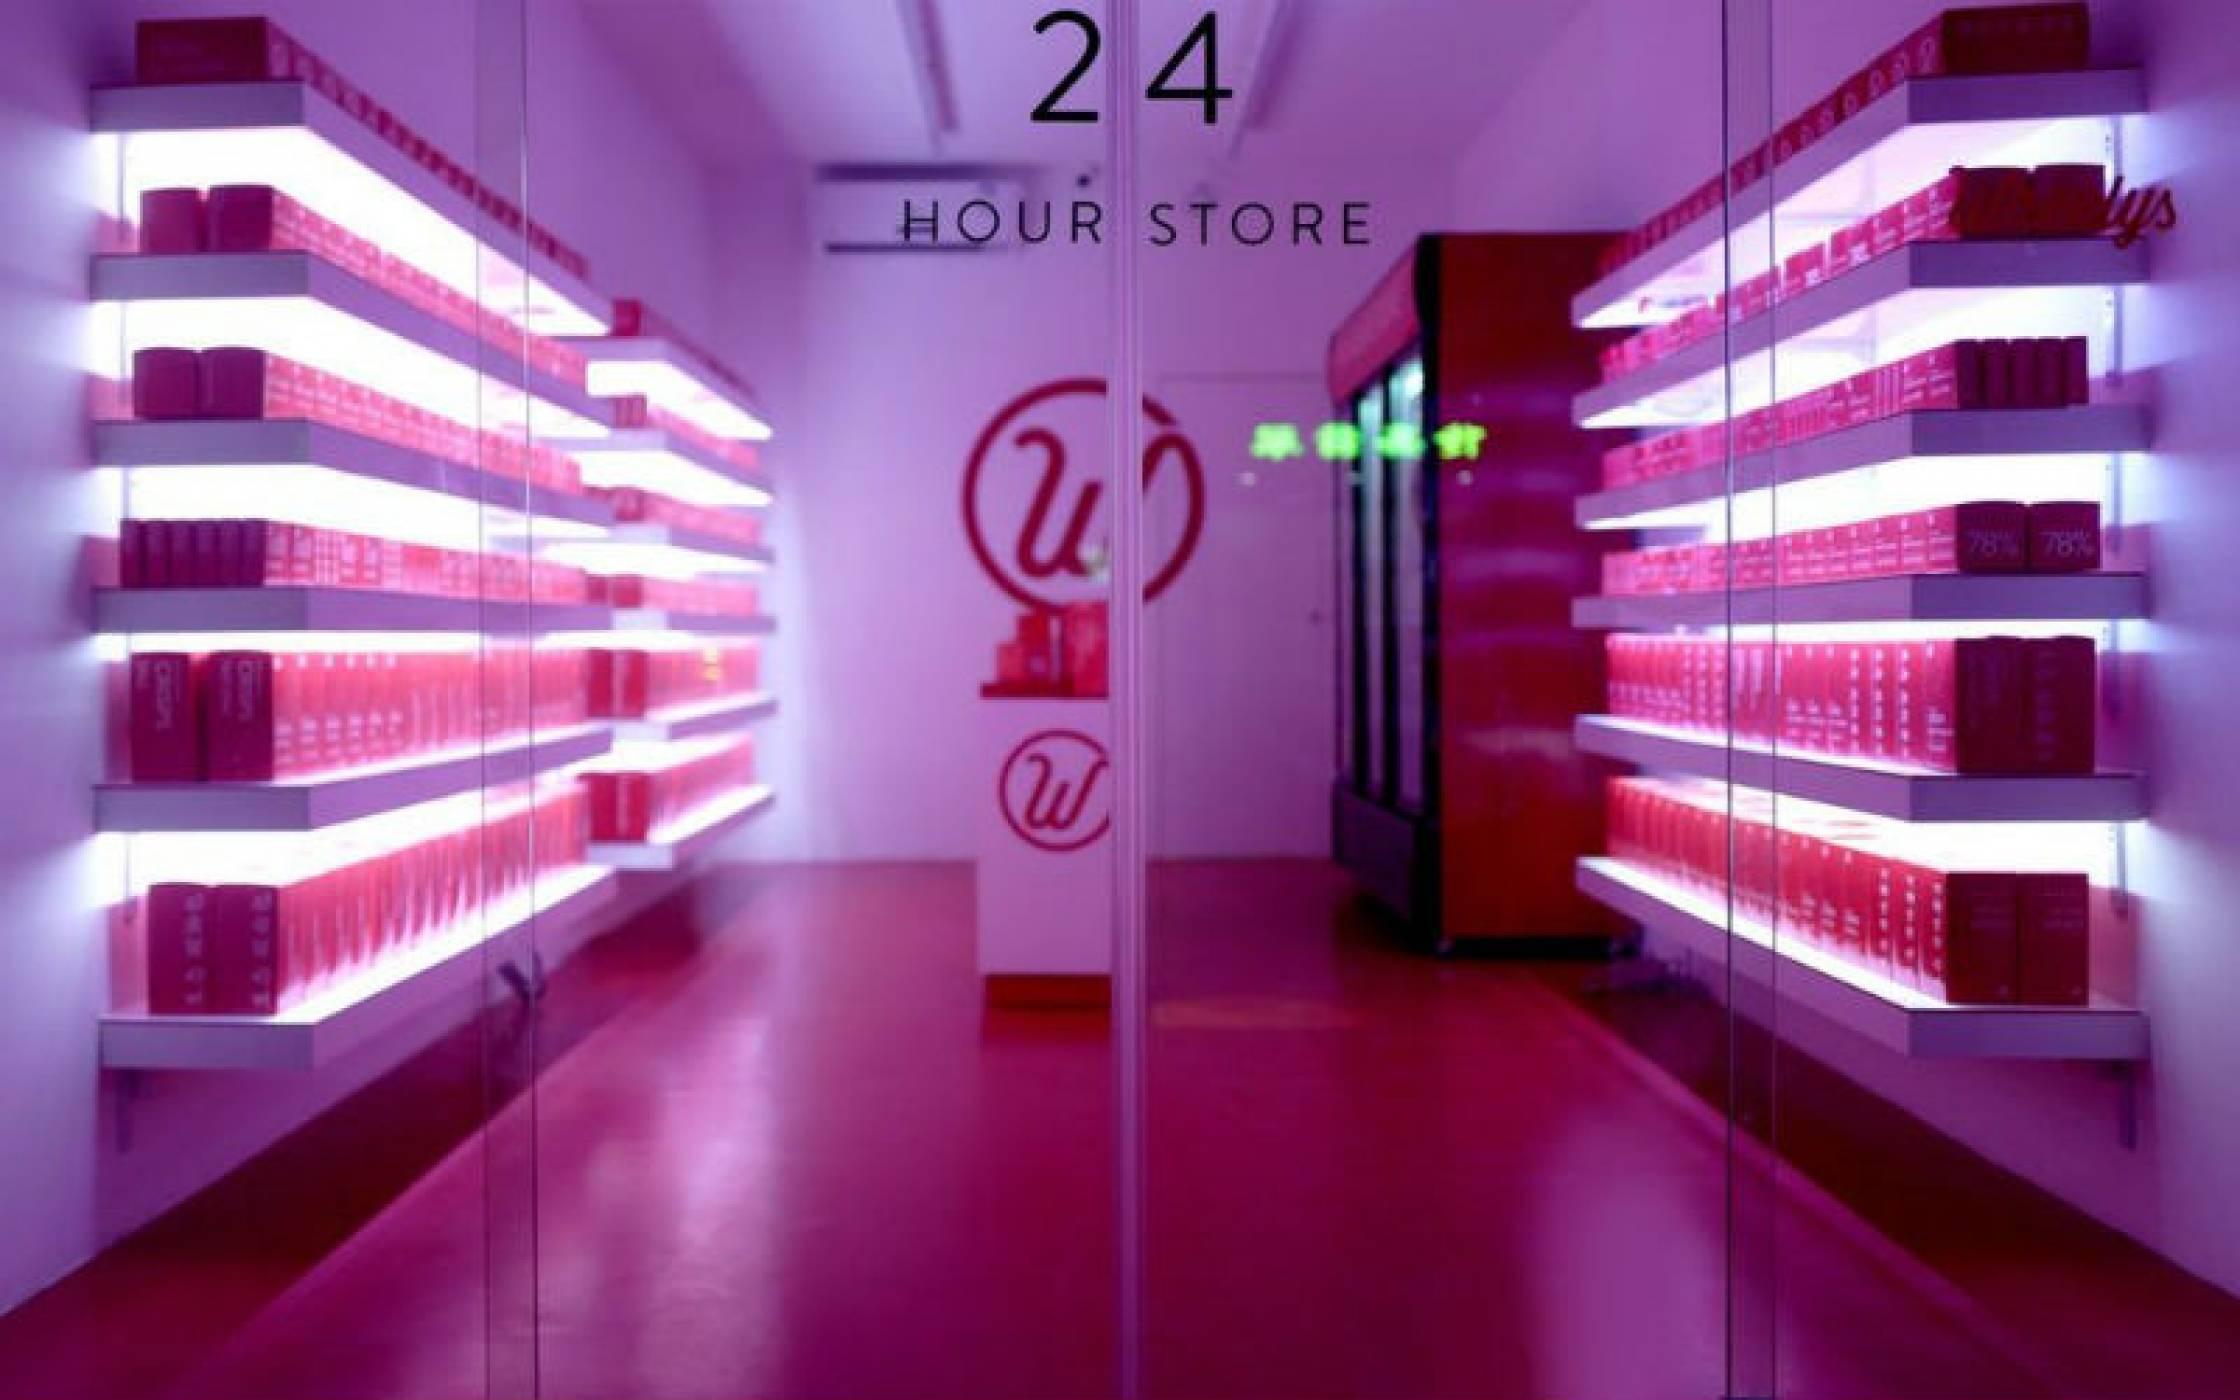 В Шанхай откриха първия магазин без продавачи